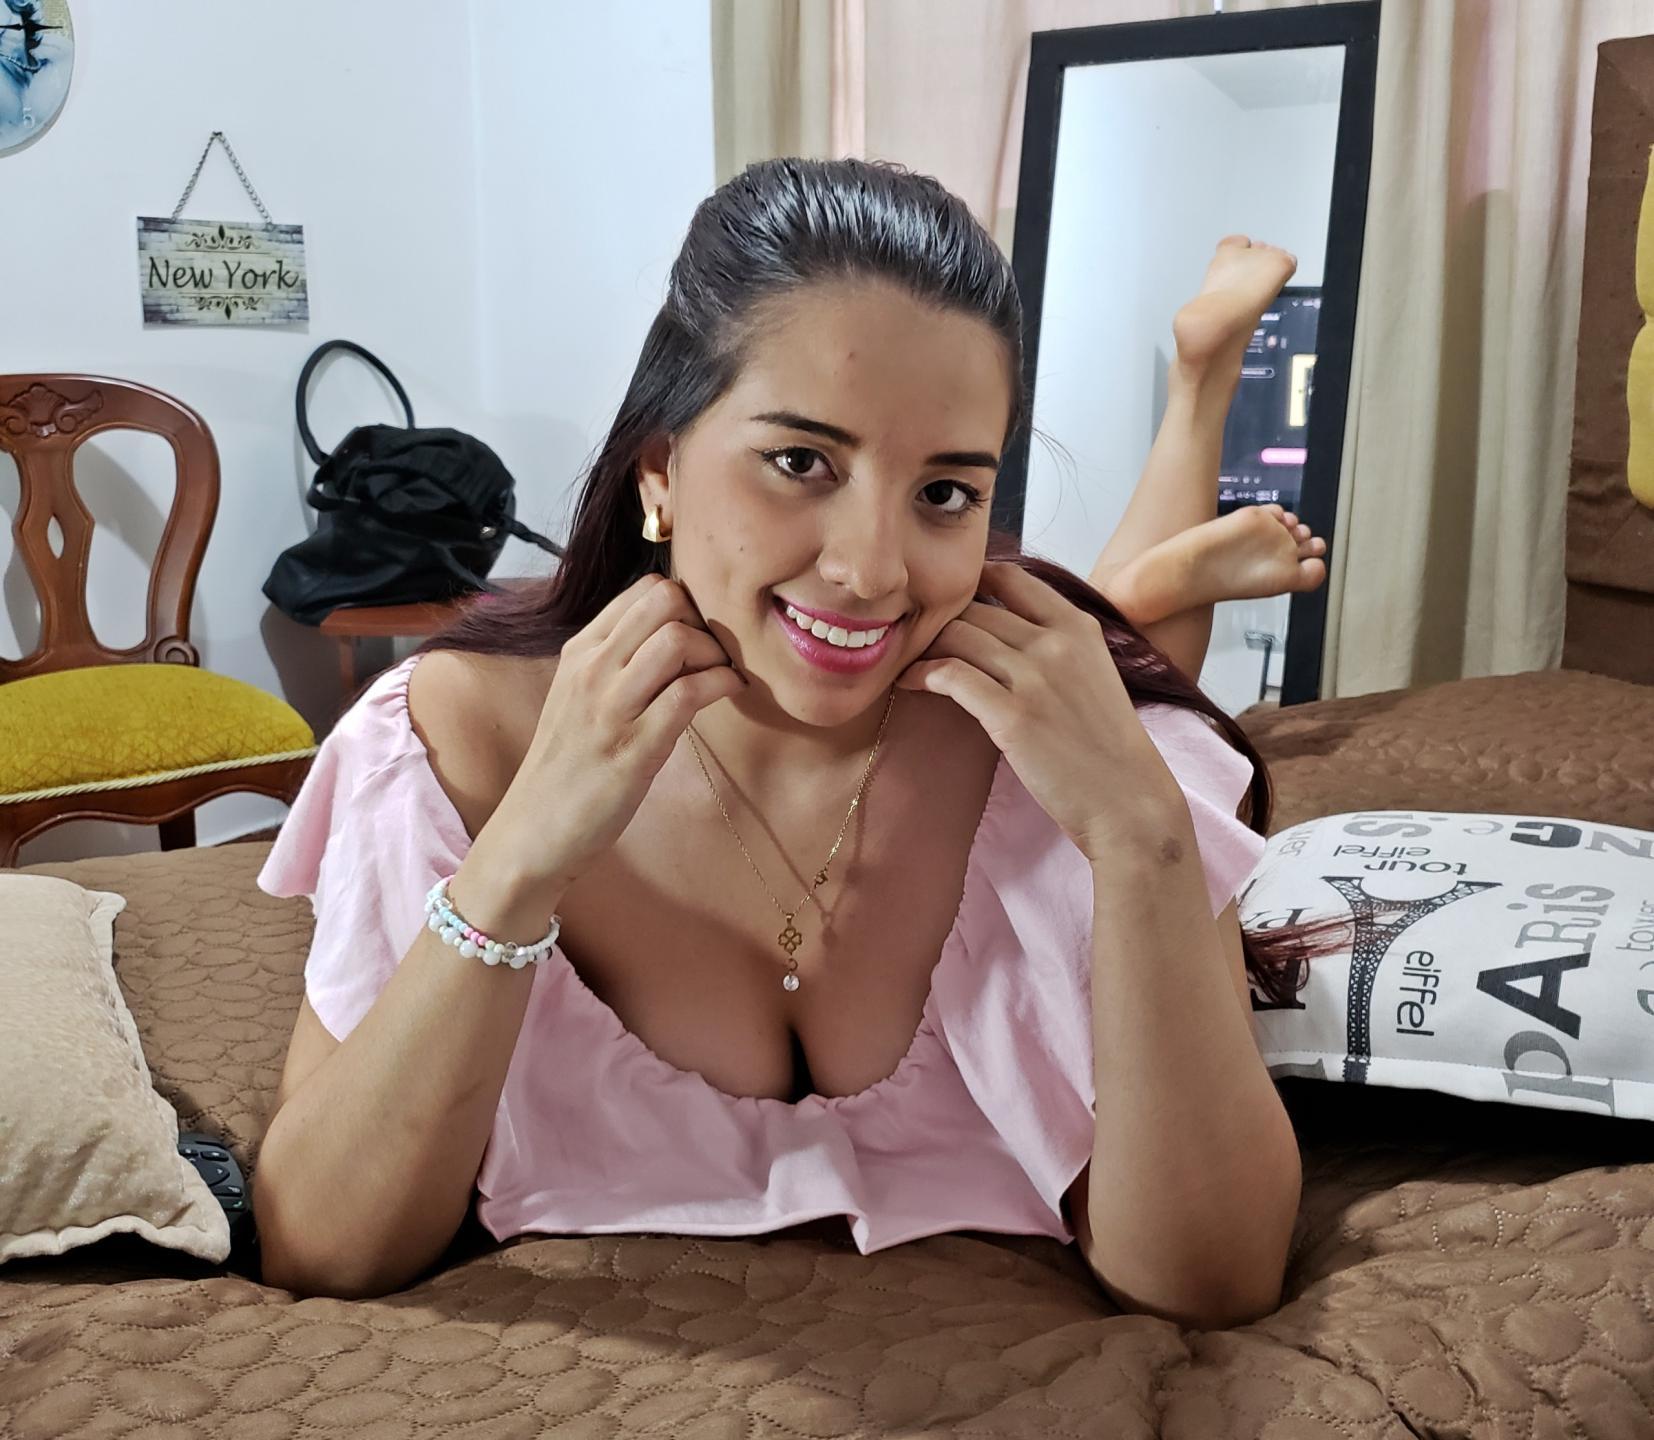 Latina Teen Writhing On Laptop Webcam For Strangers